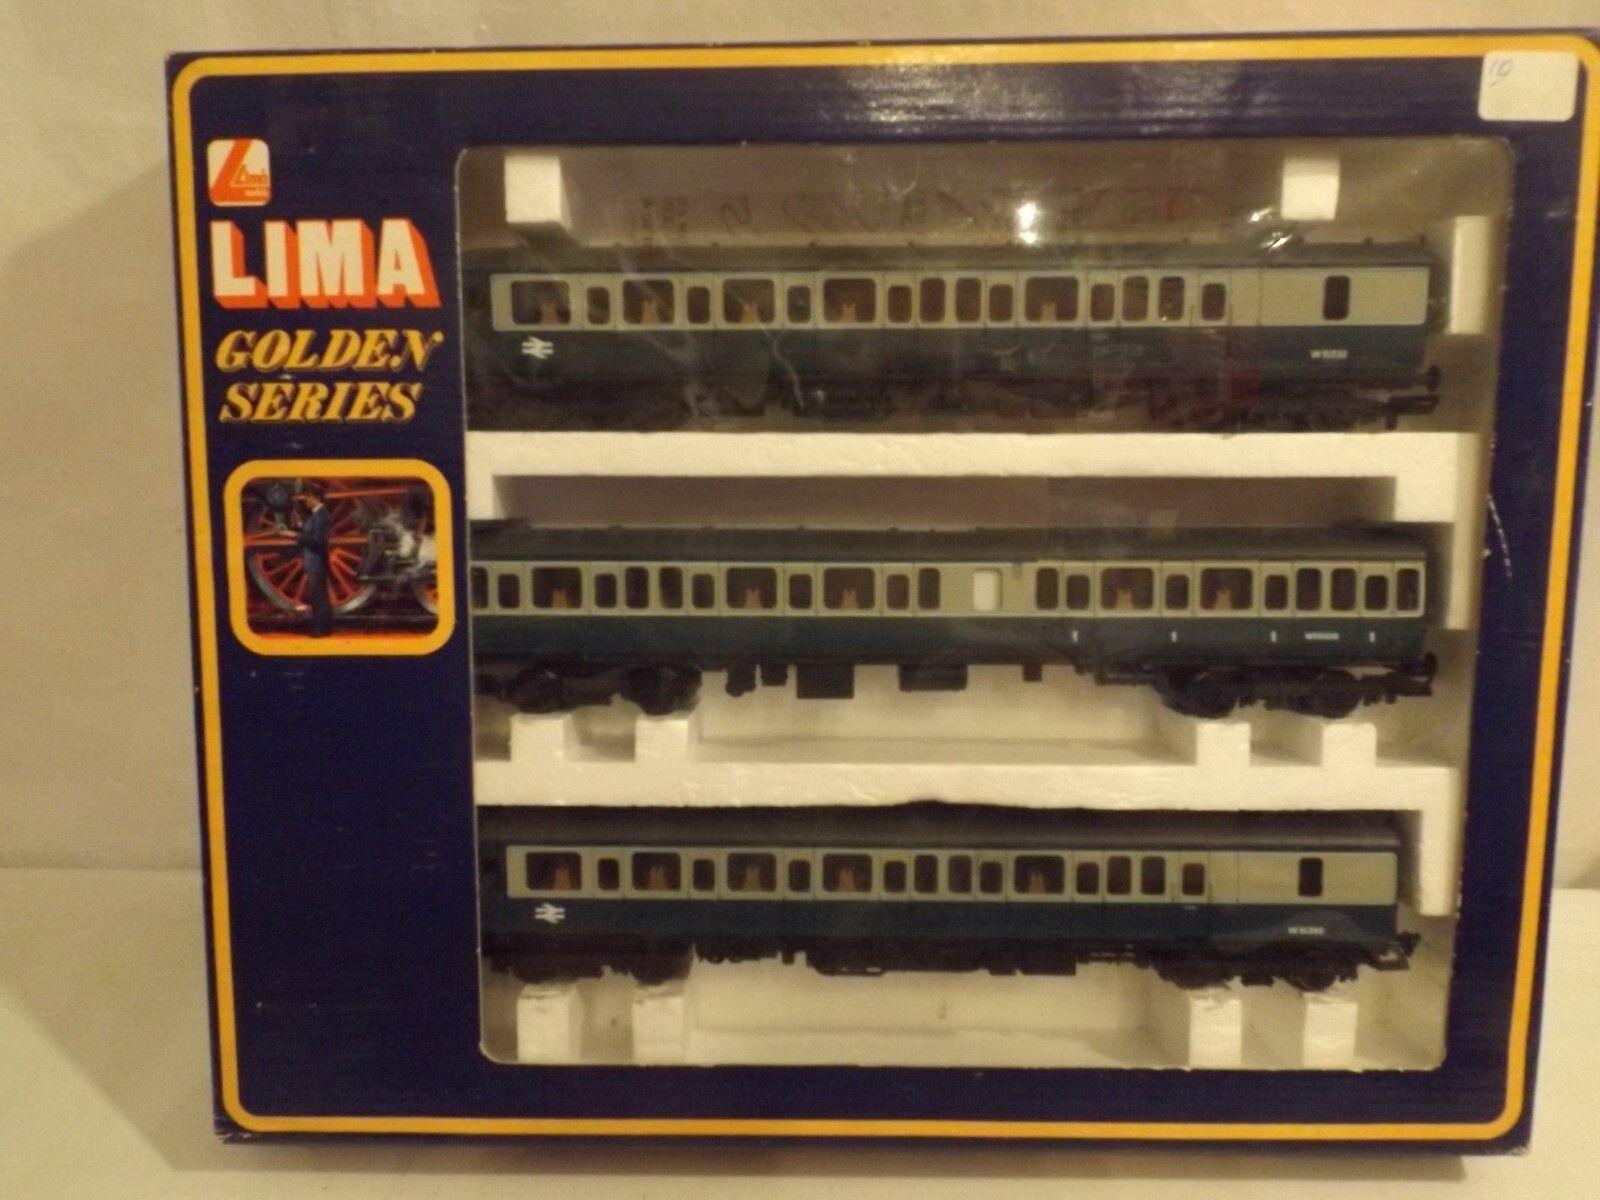 Ho Lima oroen Series PASAJERO SET en Caja Original